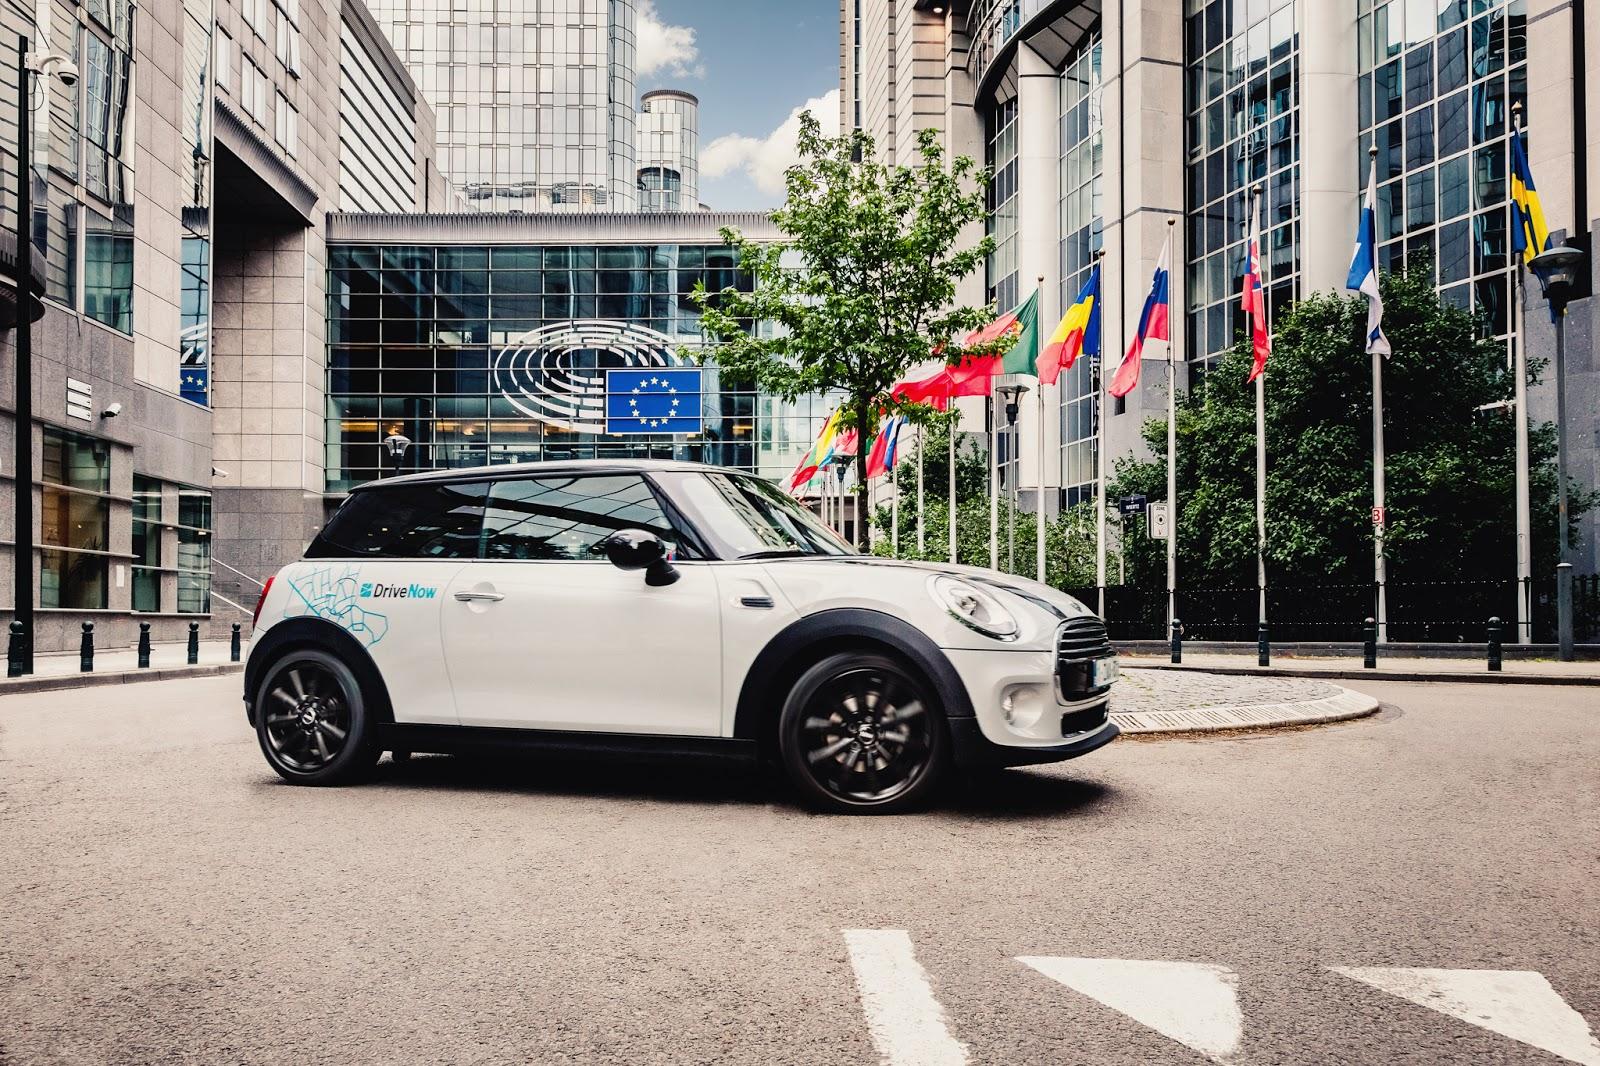 P90225910 highRes drivenow carsharing Οι Βρυξέλες γίνονται η 10η πόλη του προγράμματος κοινοχρησίας οχημάτων